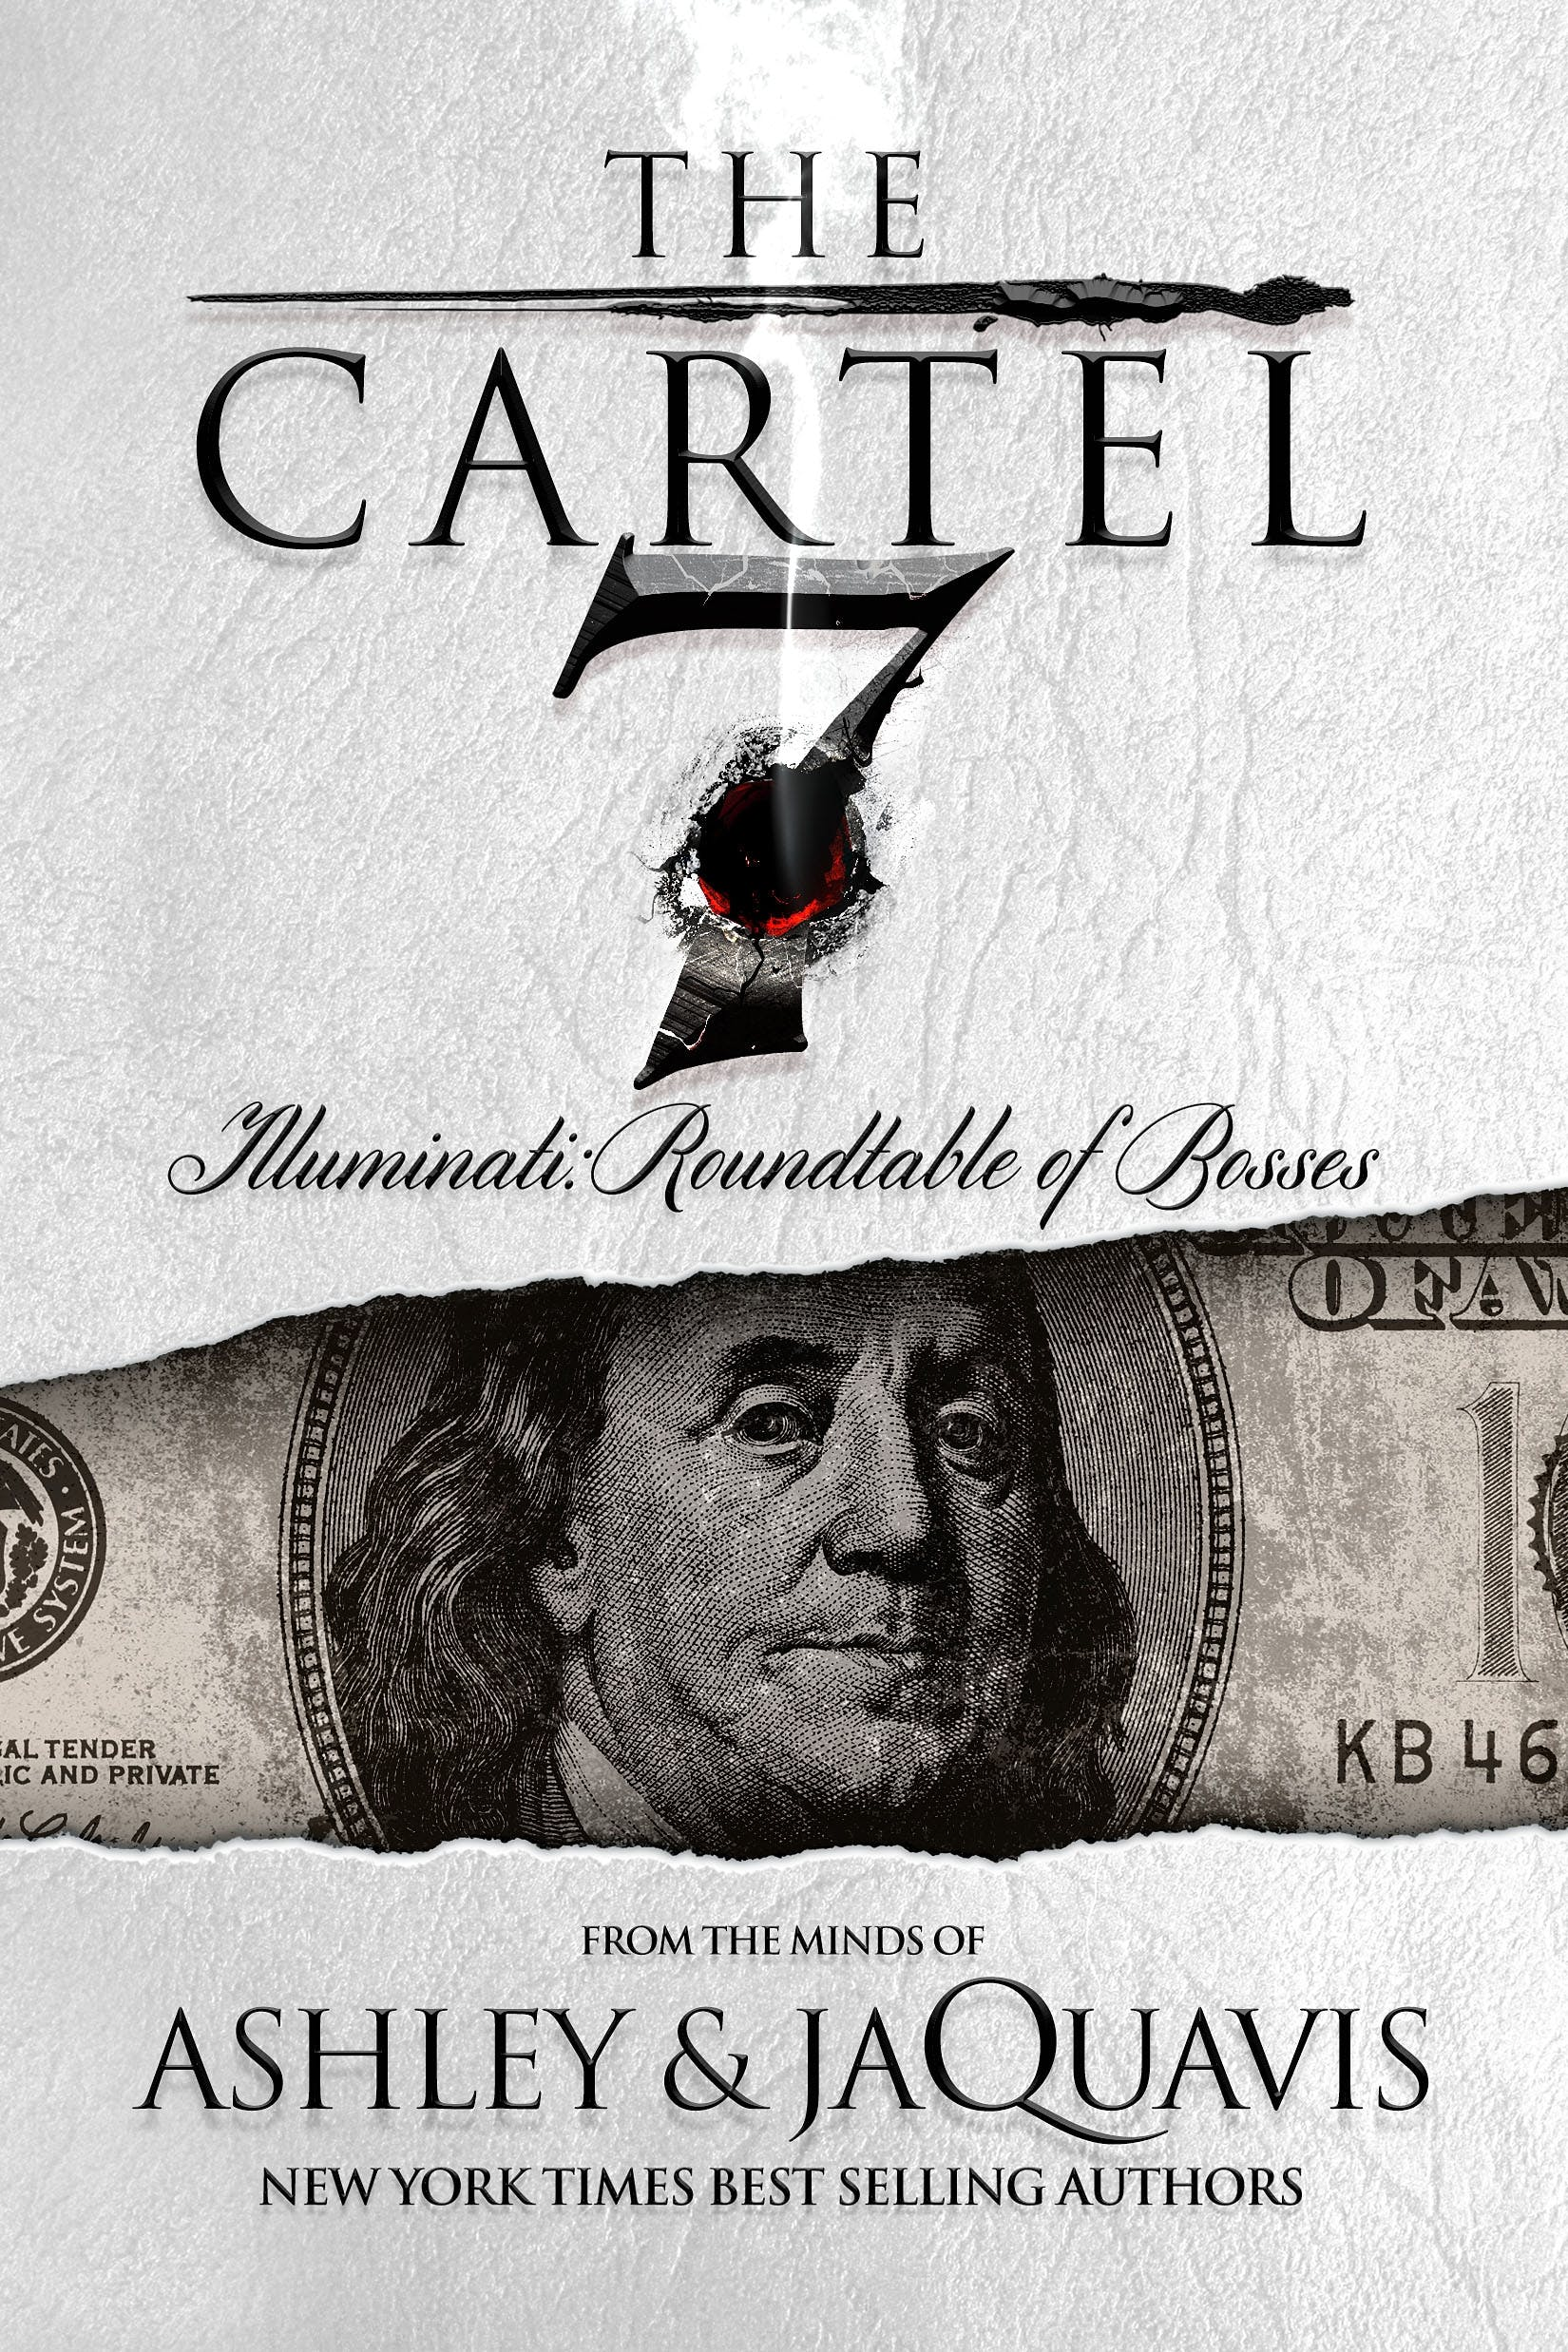 Image of The Cartel 7: Illuminati